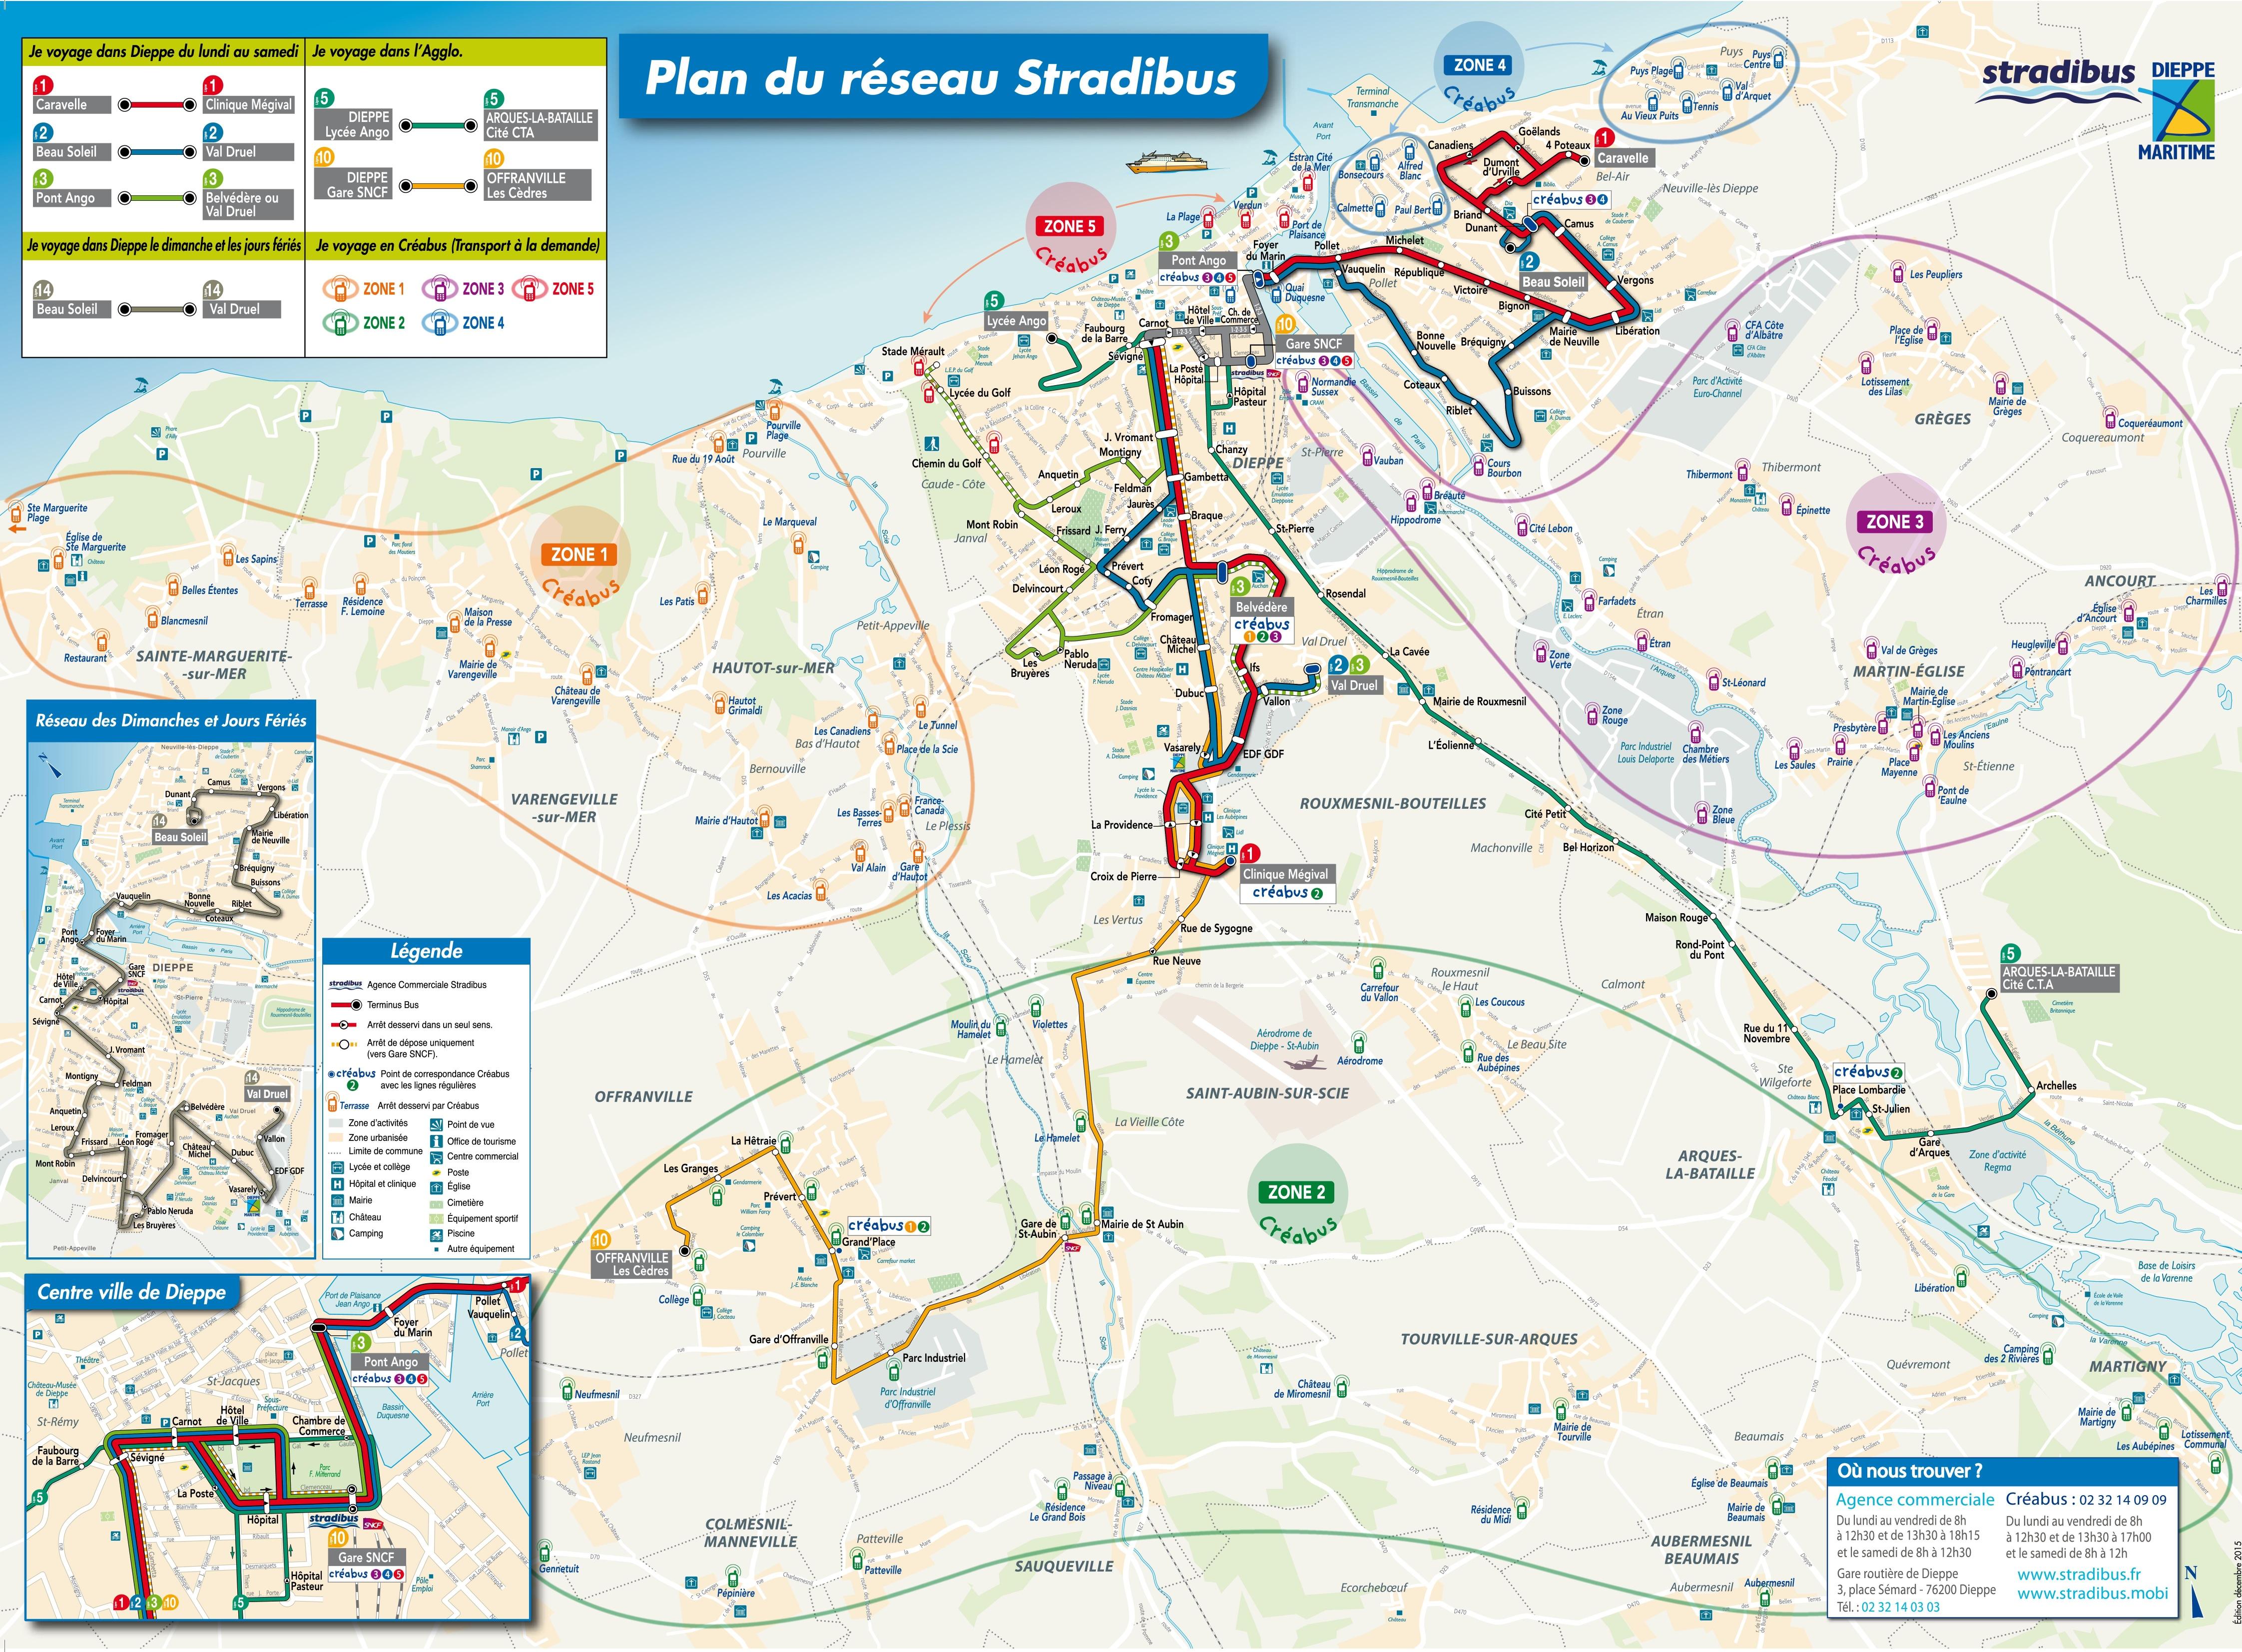 Dieppe transport map